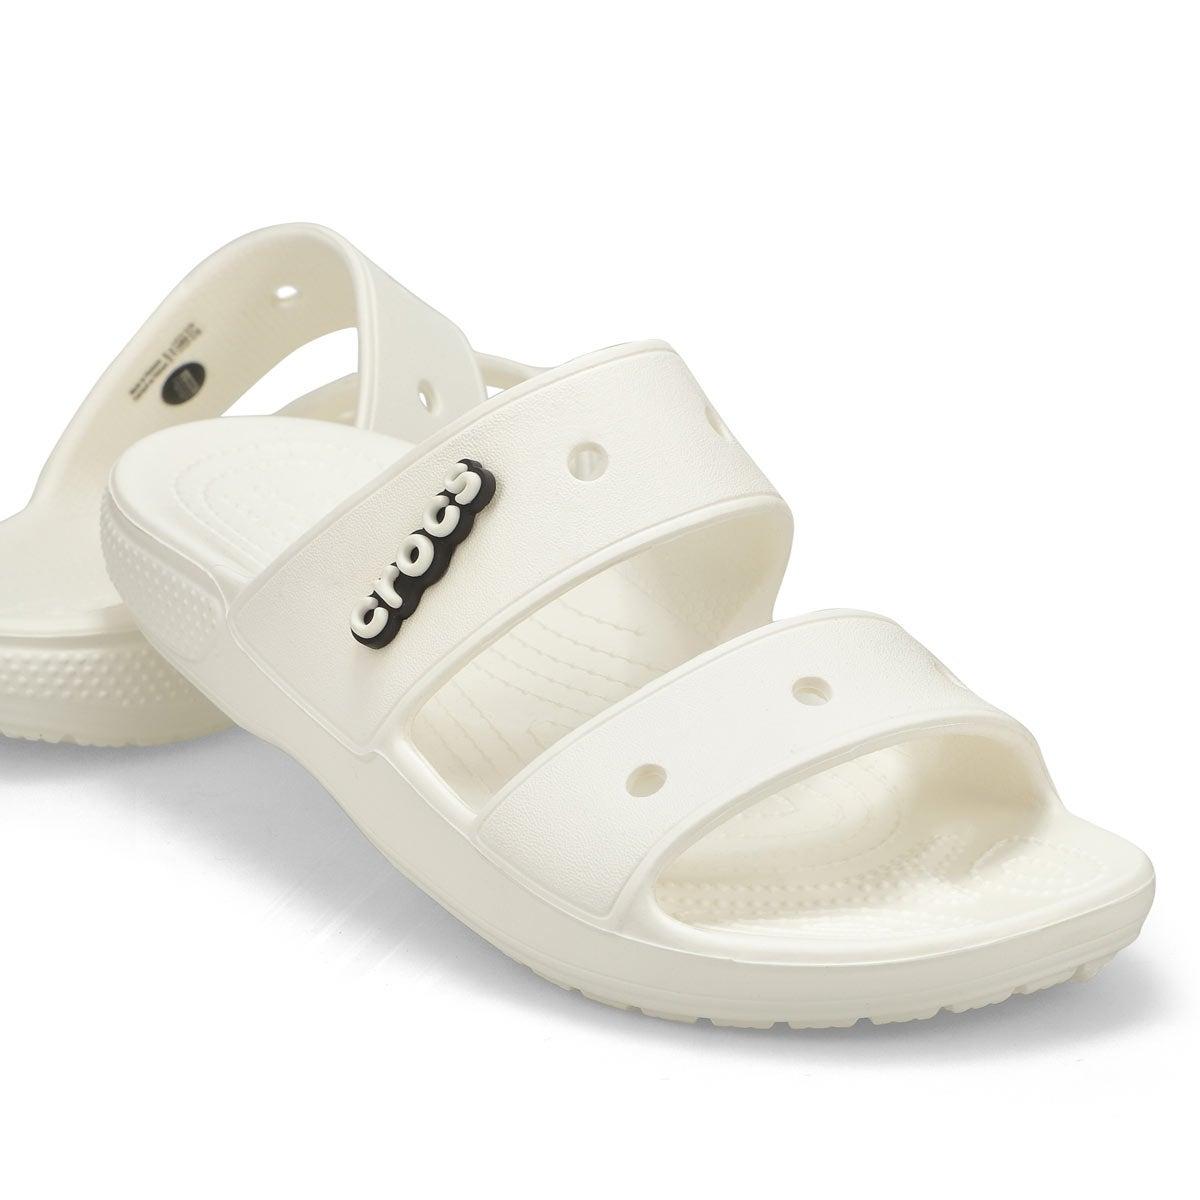 Sabot Classic Crocs Slide,blanc,femme